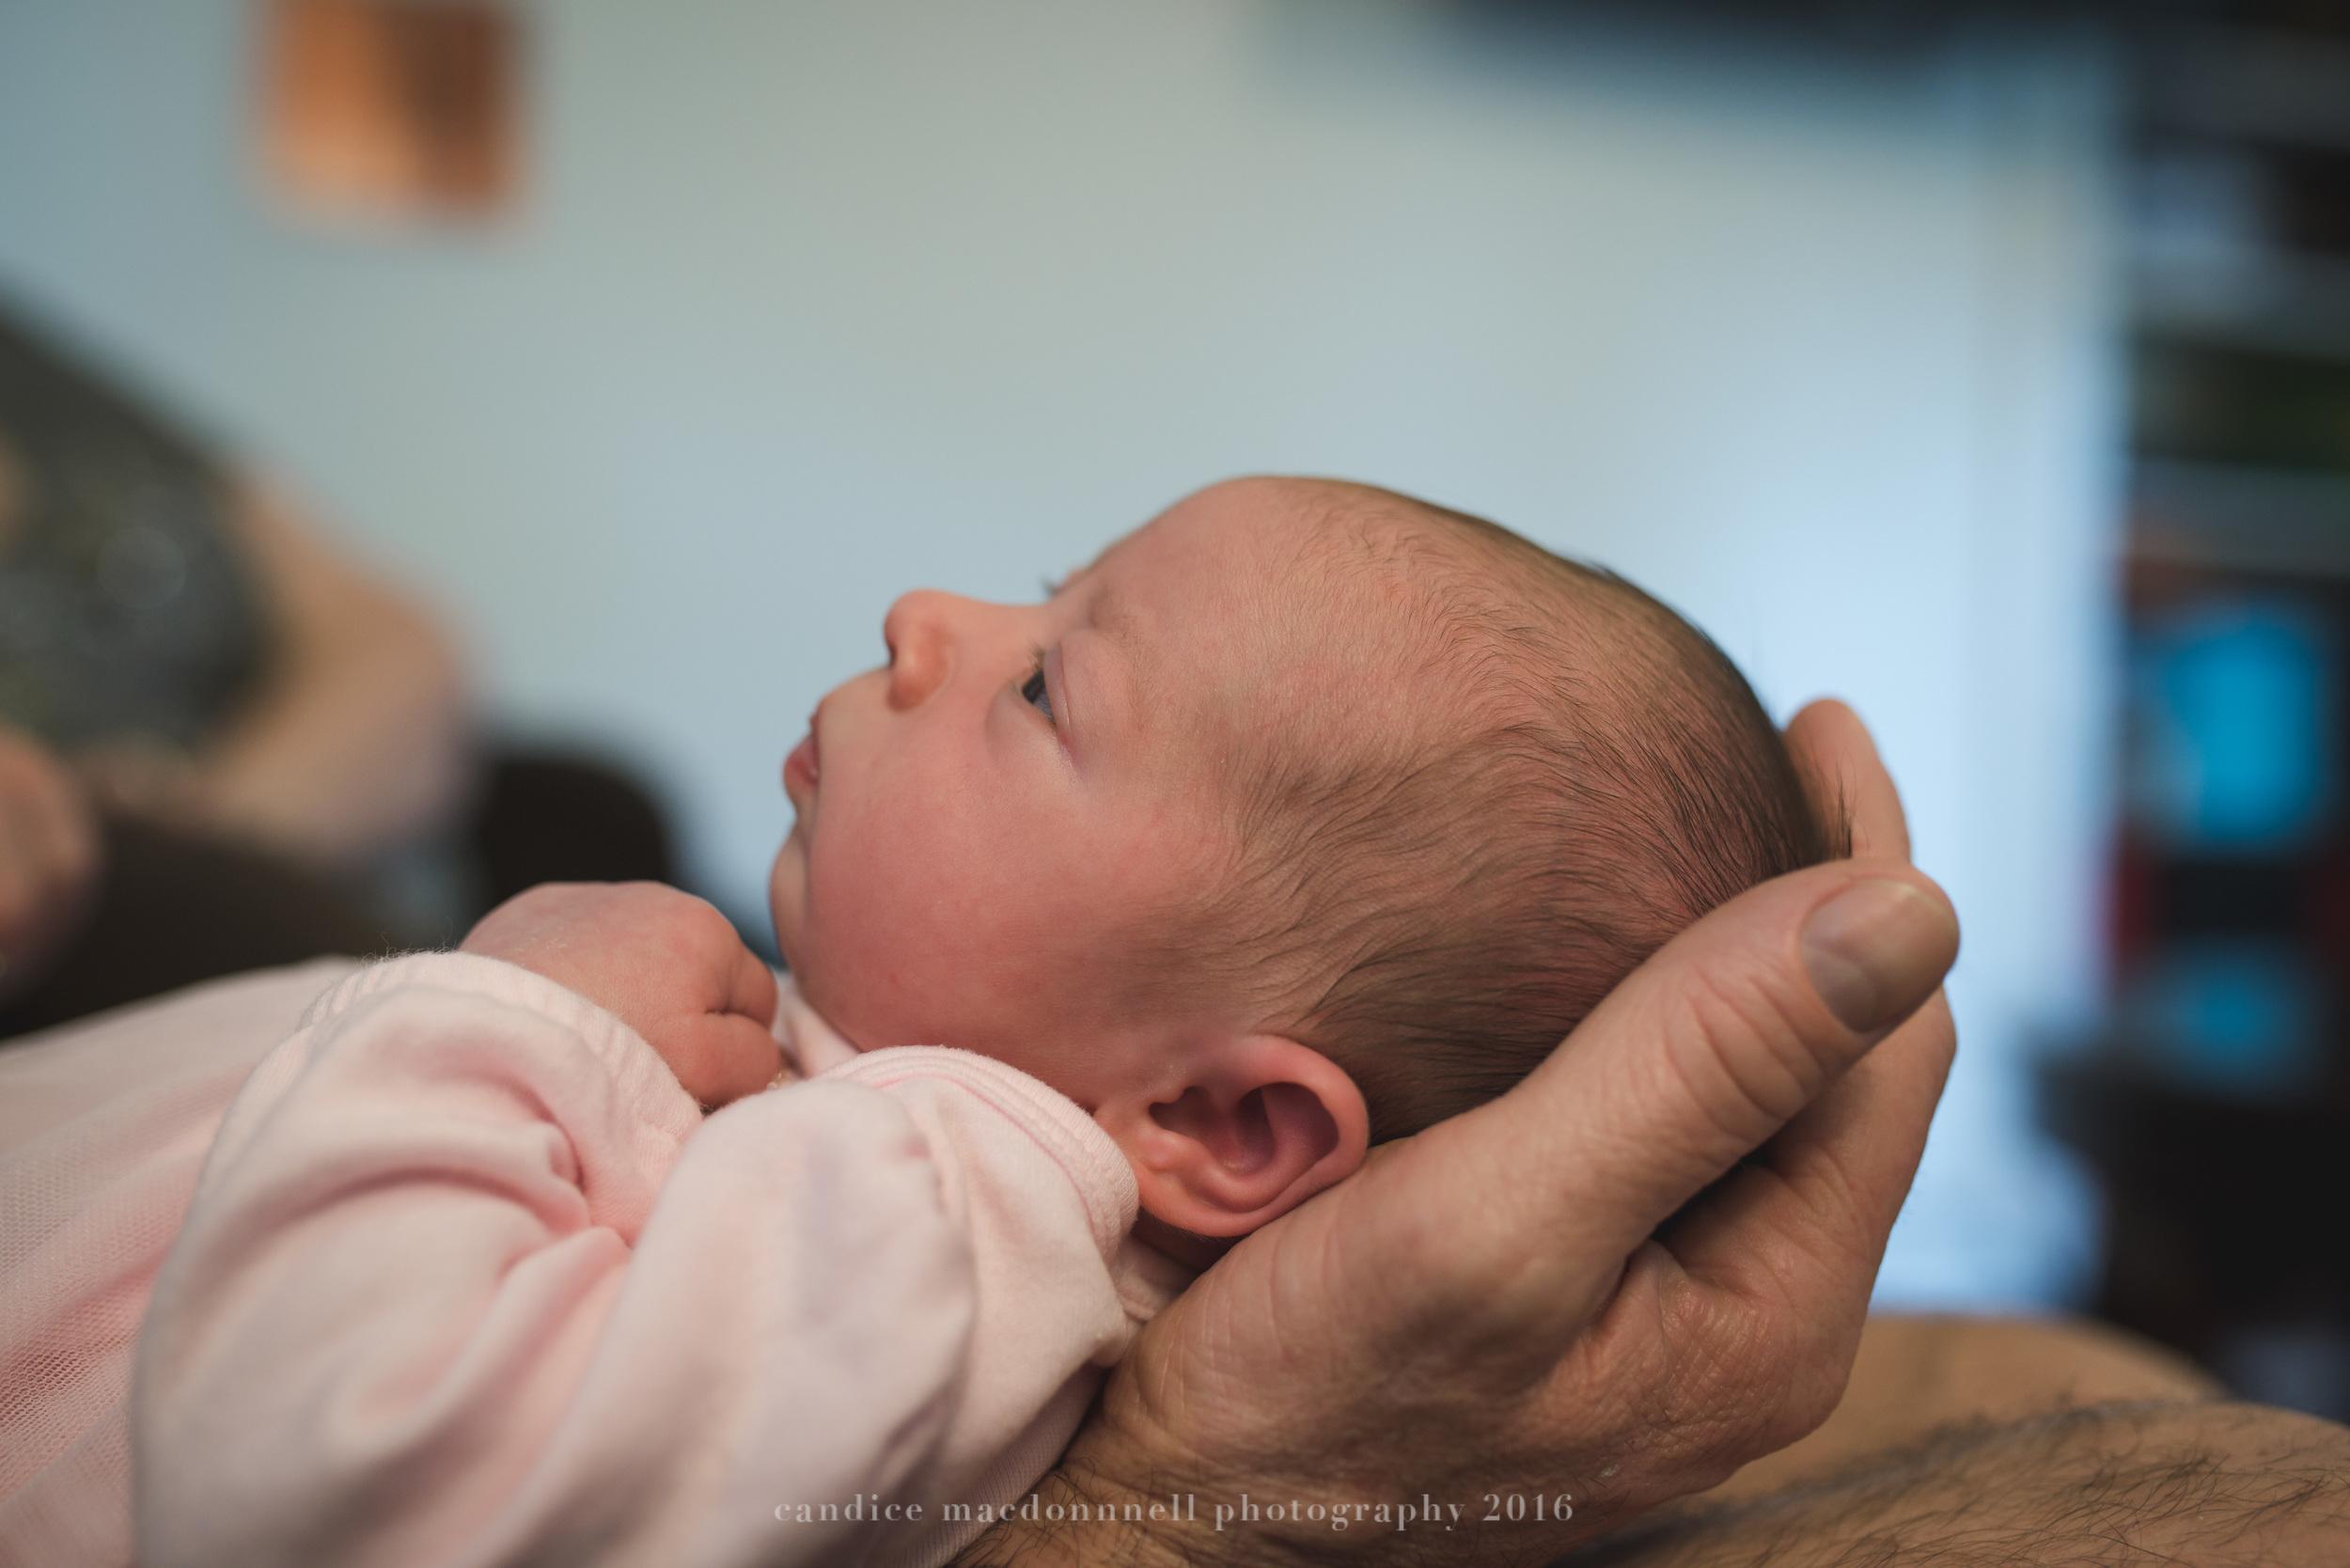 newborn baby girl in hands lifestyle photograph oahu hawaii photographer